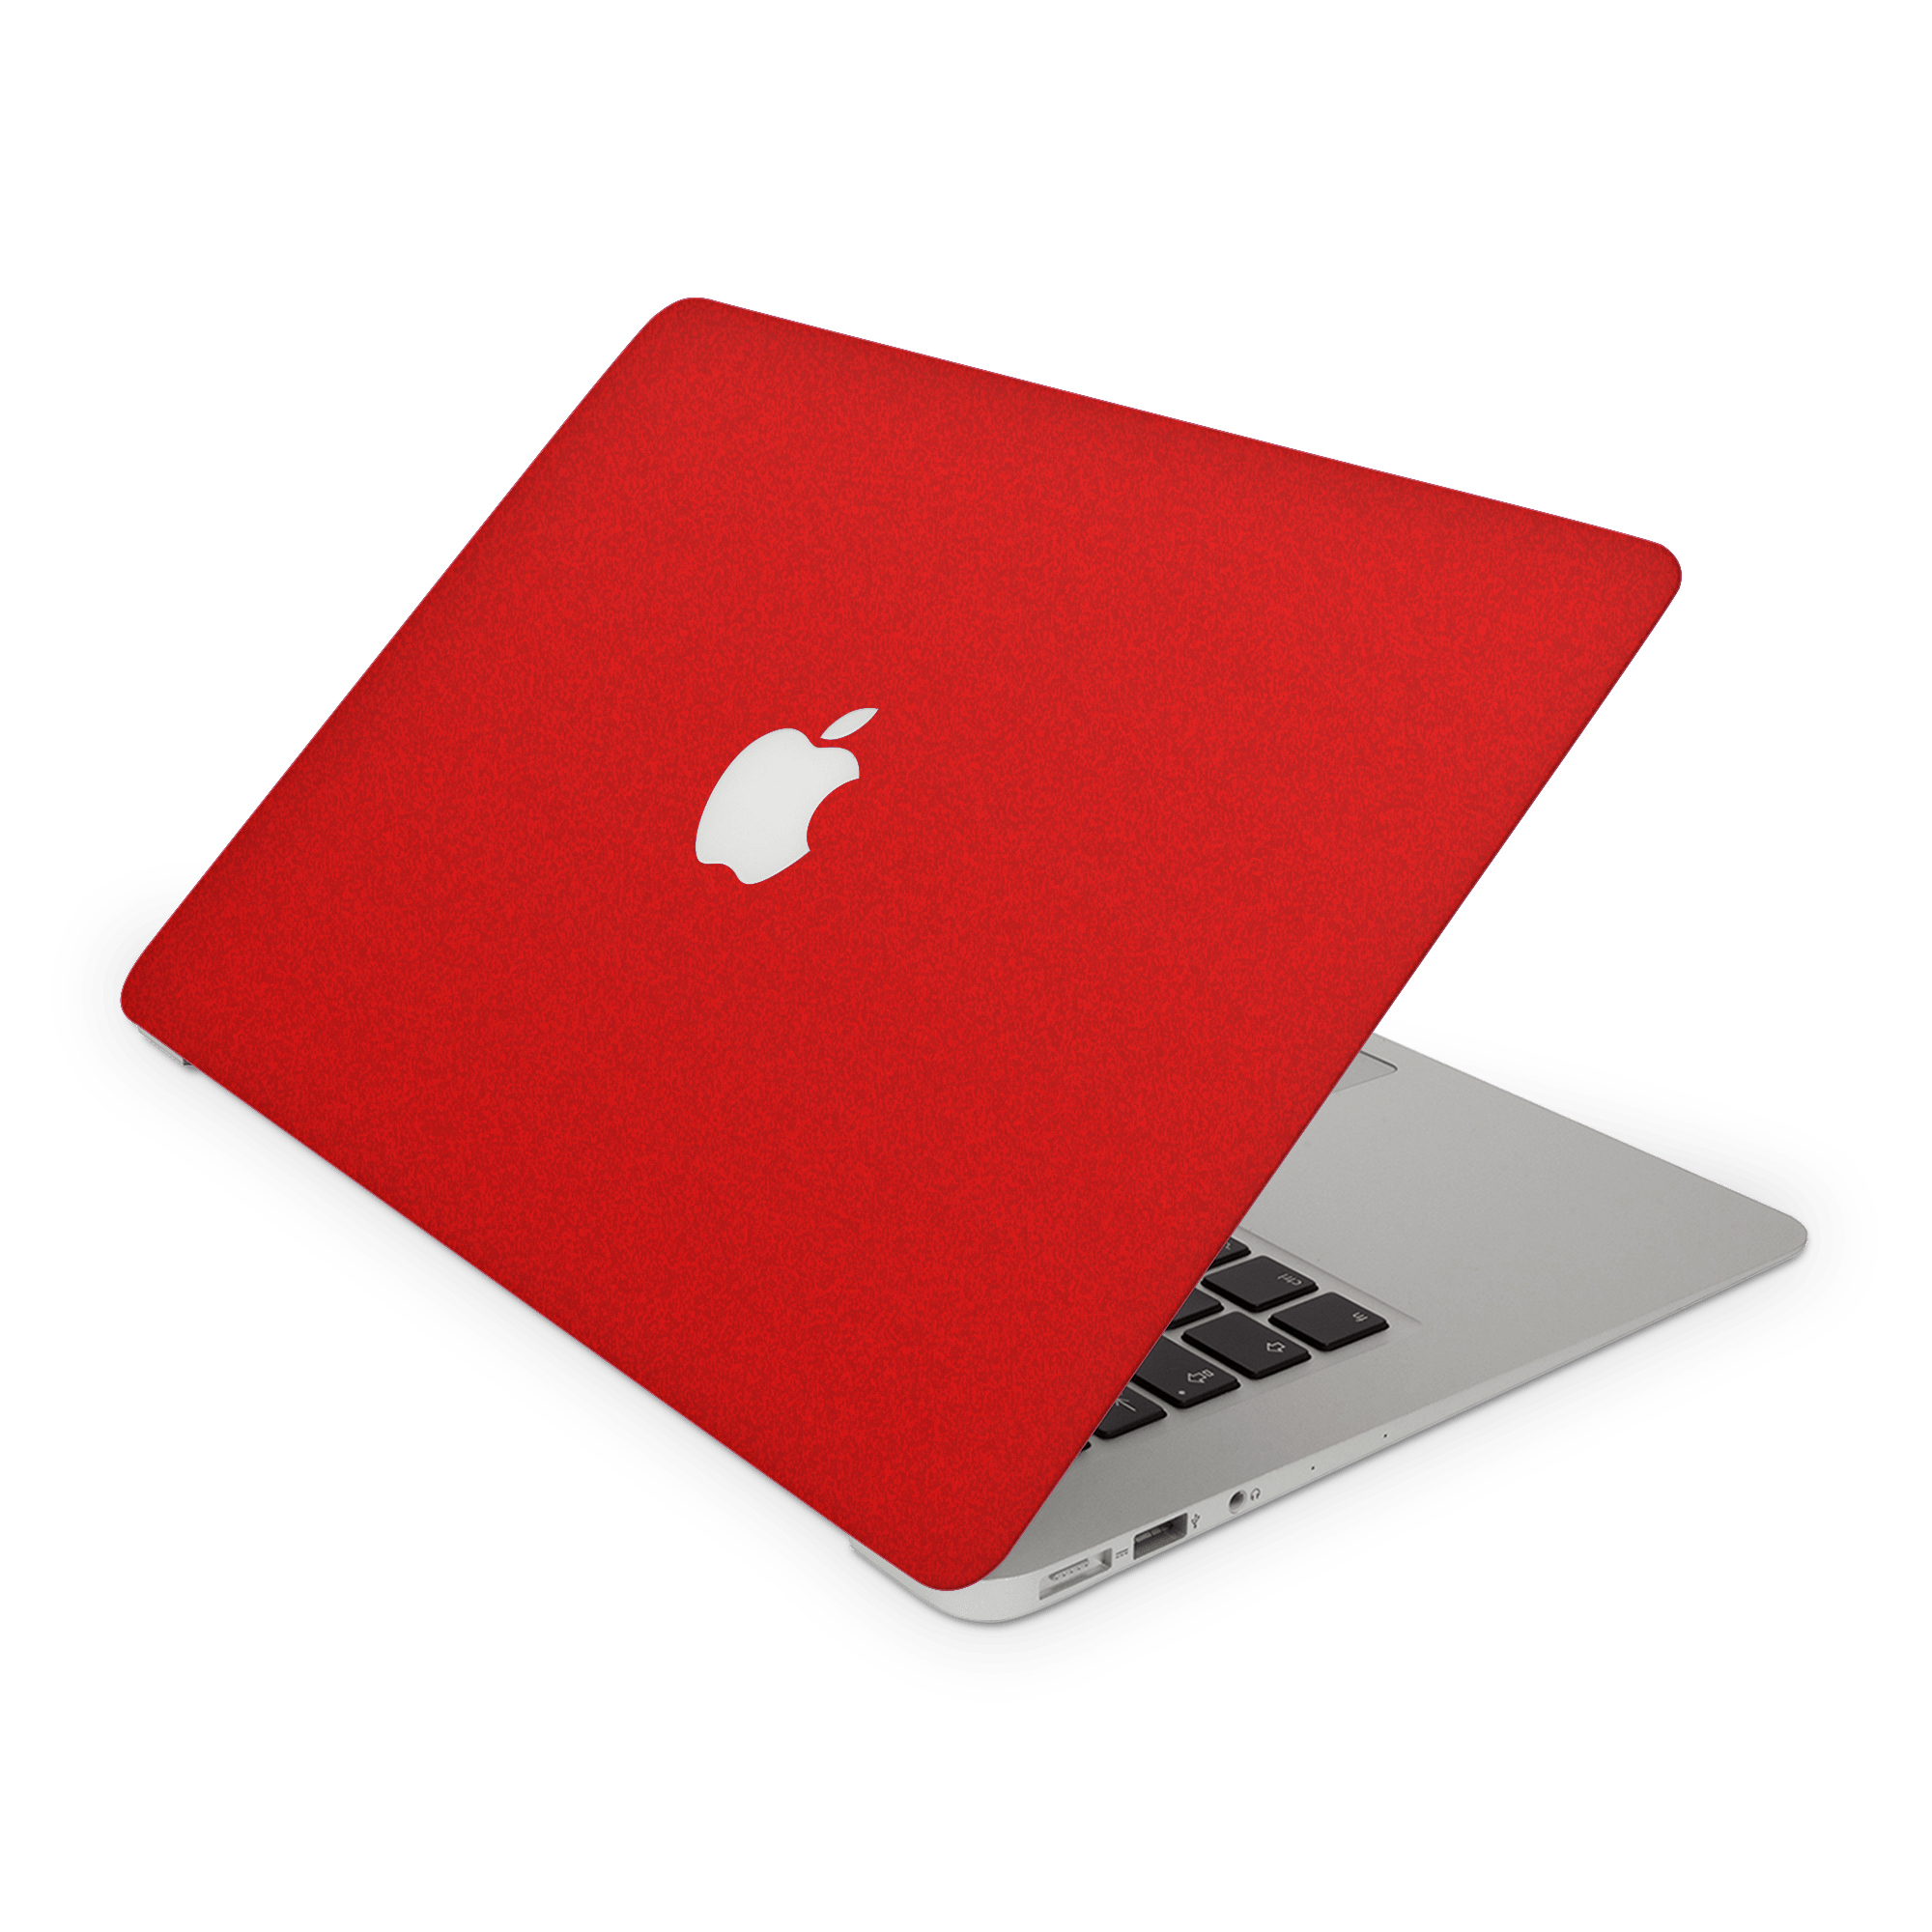 macbook pro 15 inch 2016 2017 skin faded rood ucustom. Black Bedroom Furniture Sets. Home Design Ideas